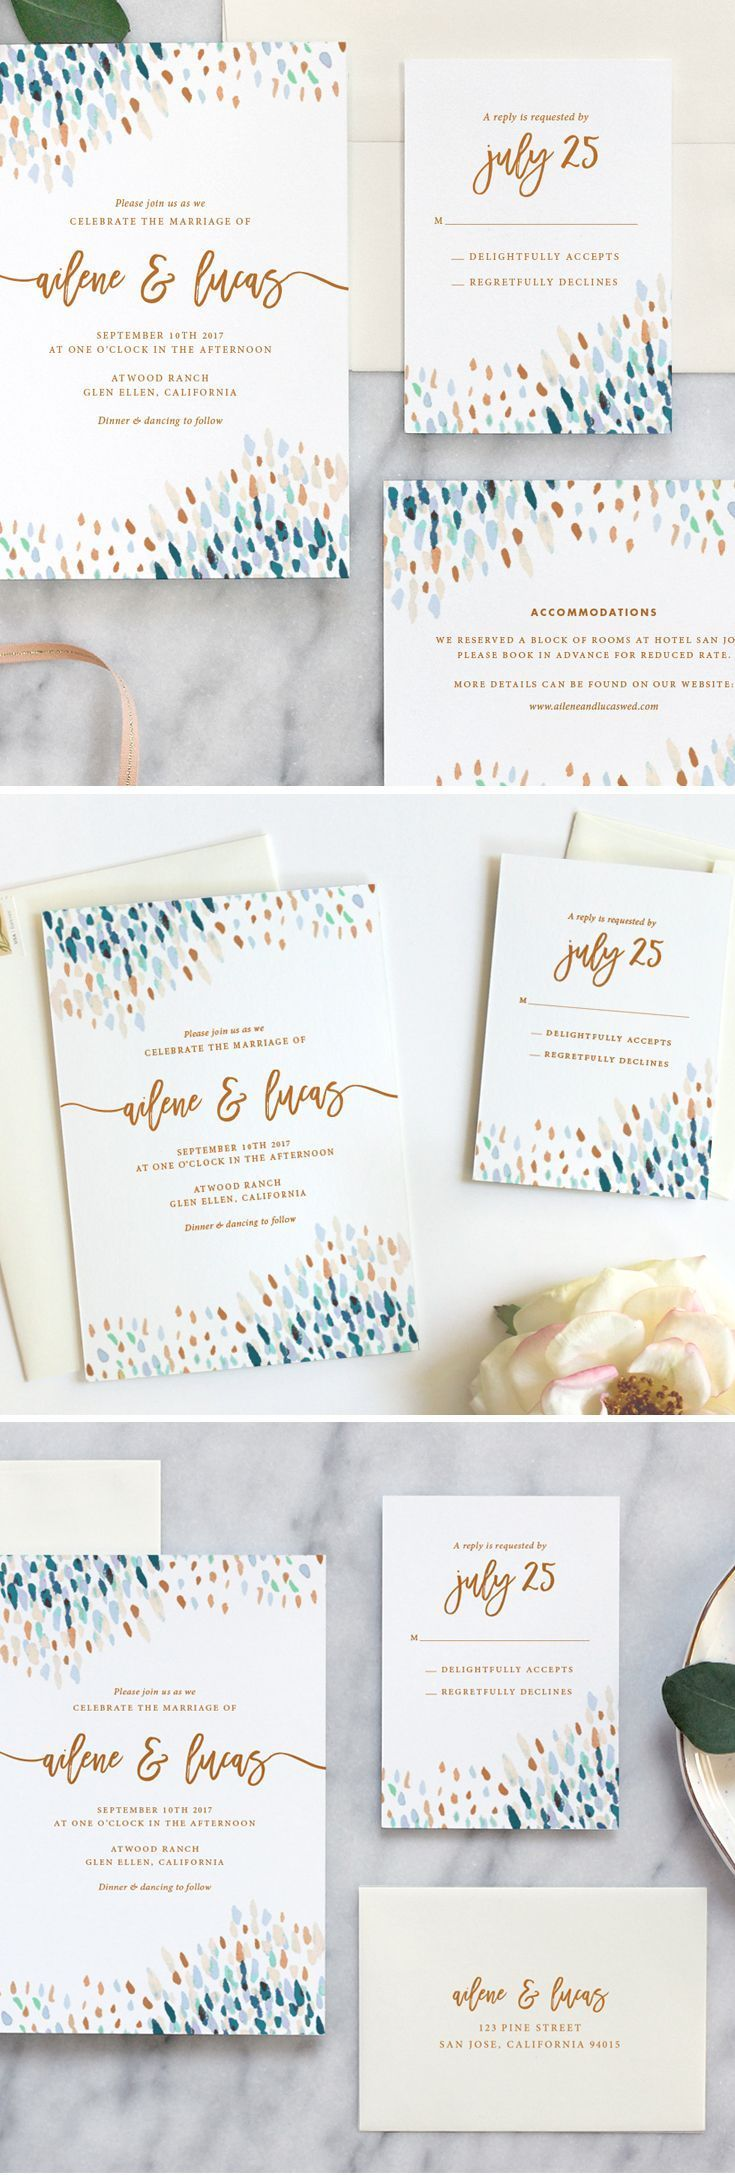 8444 Best Wedding Stationery Images On Pinterest Invitations